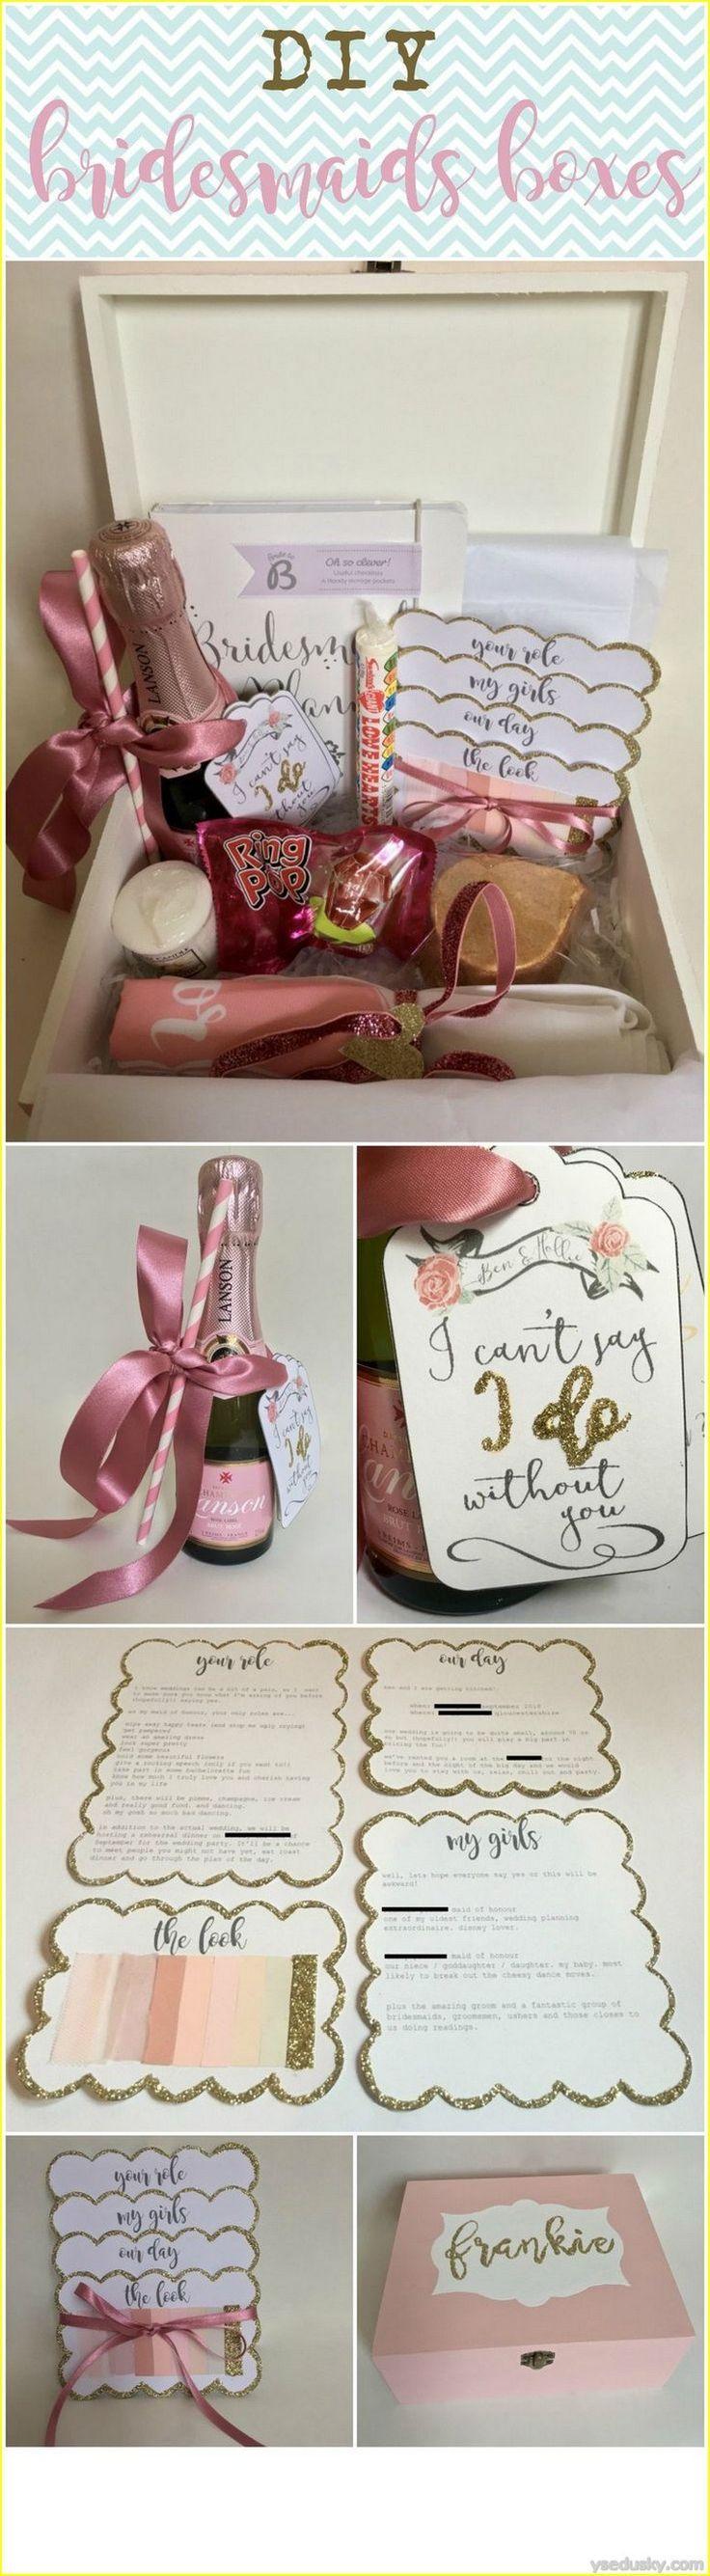 bridesmaid diy bridesmaid gift